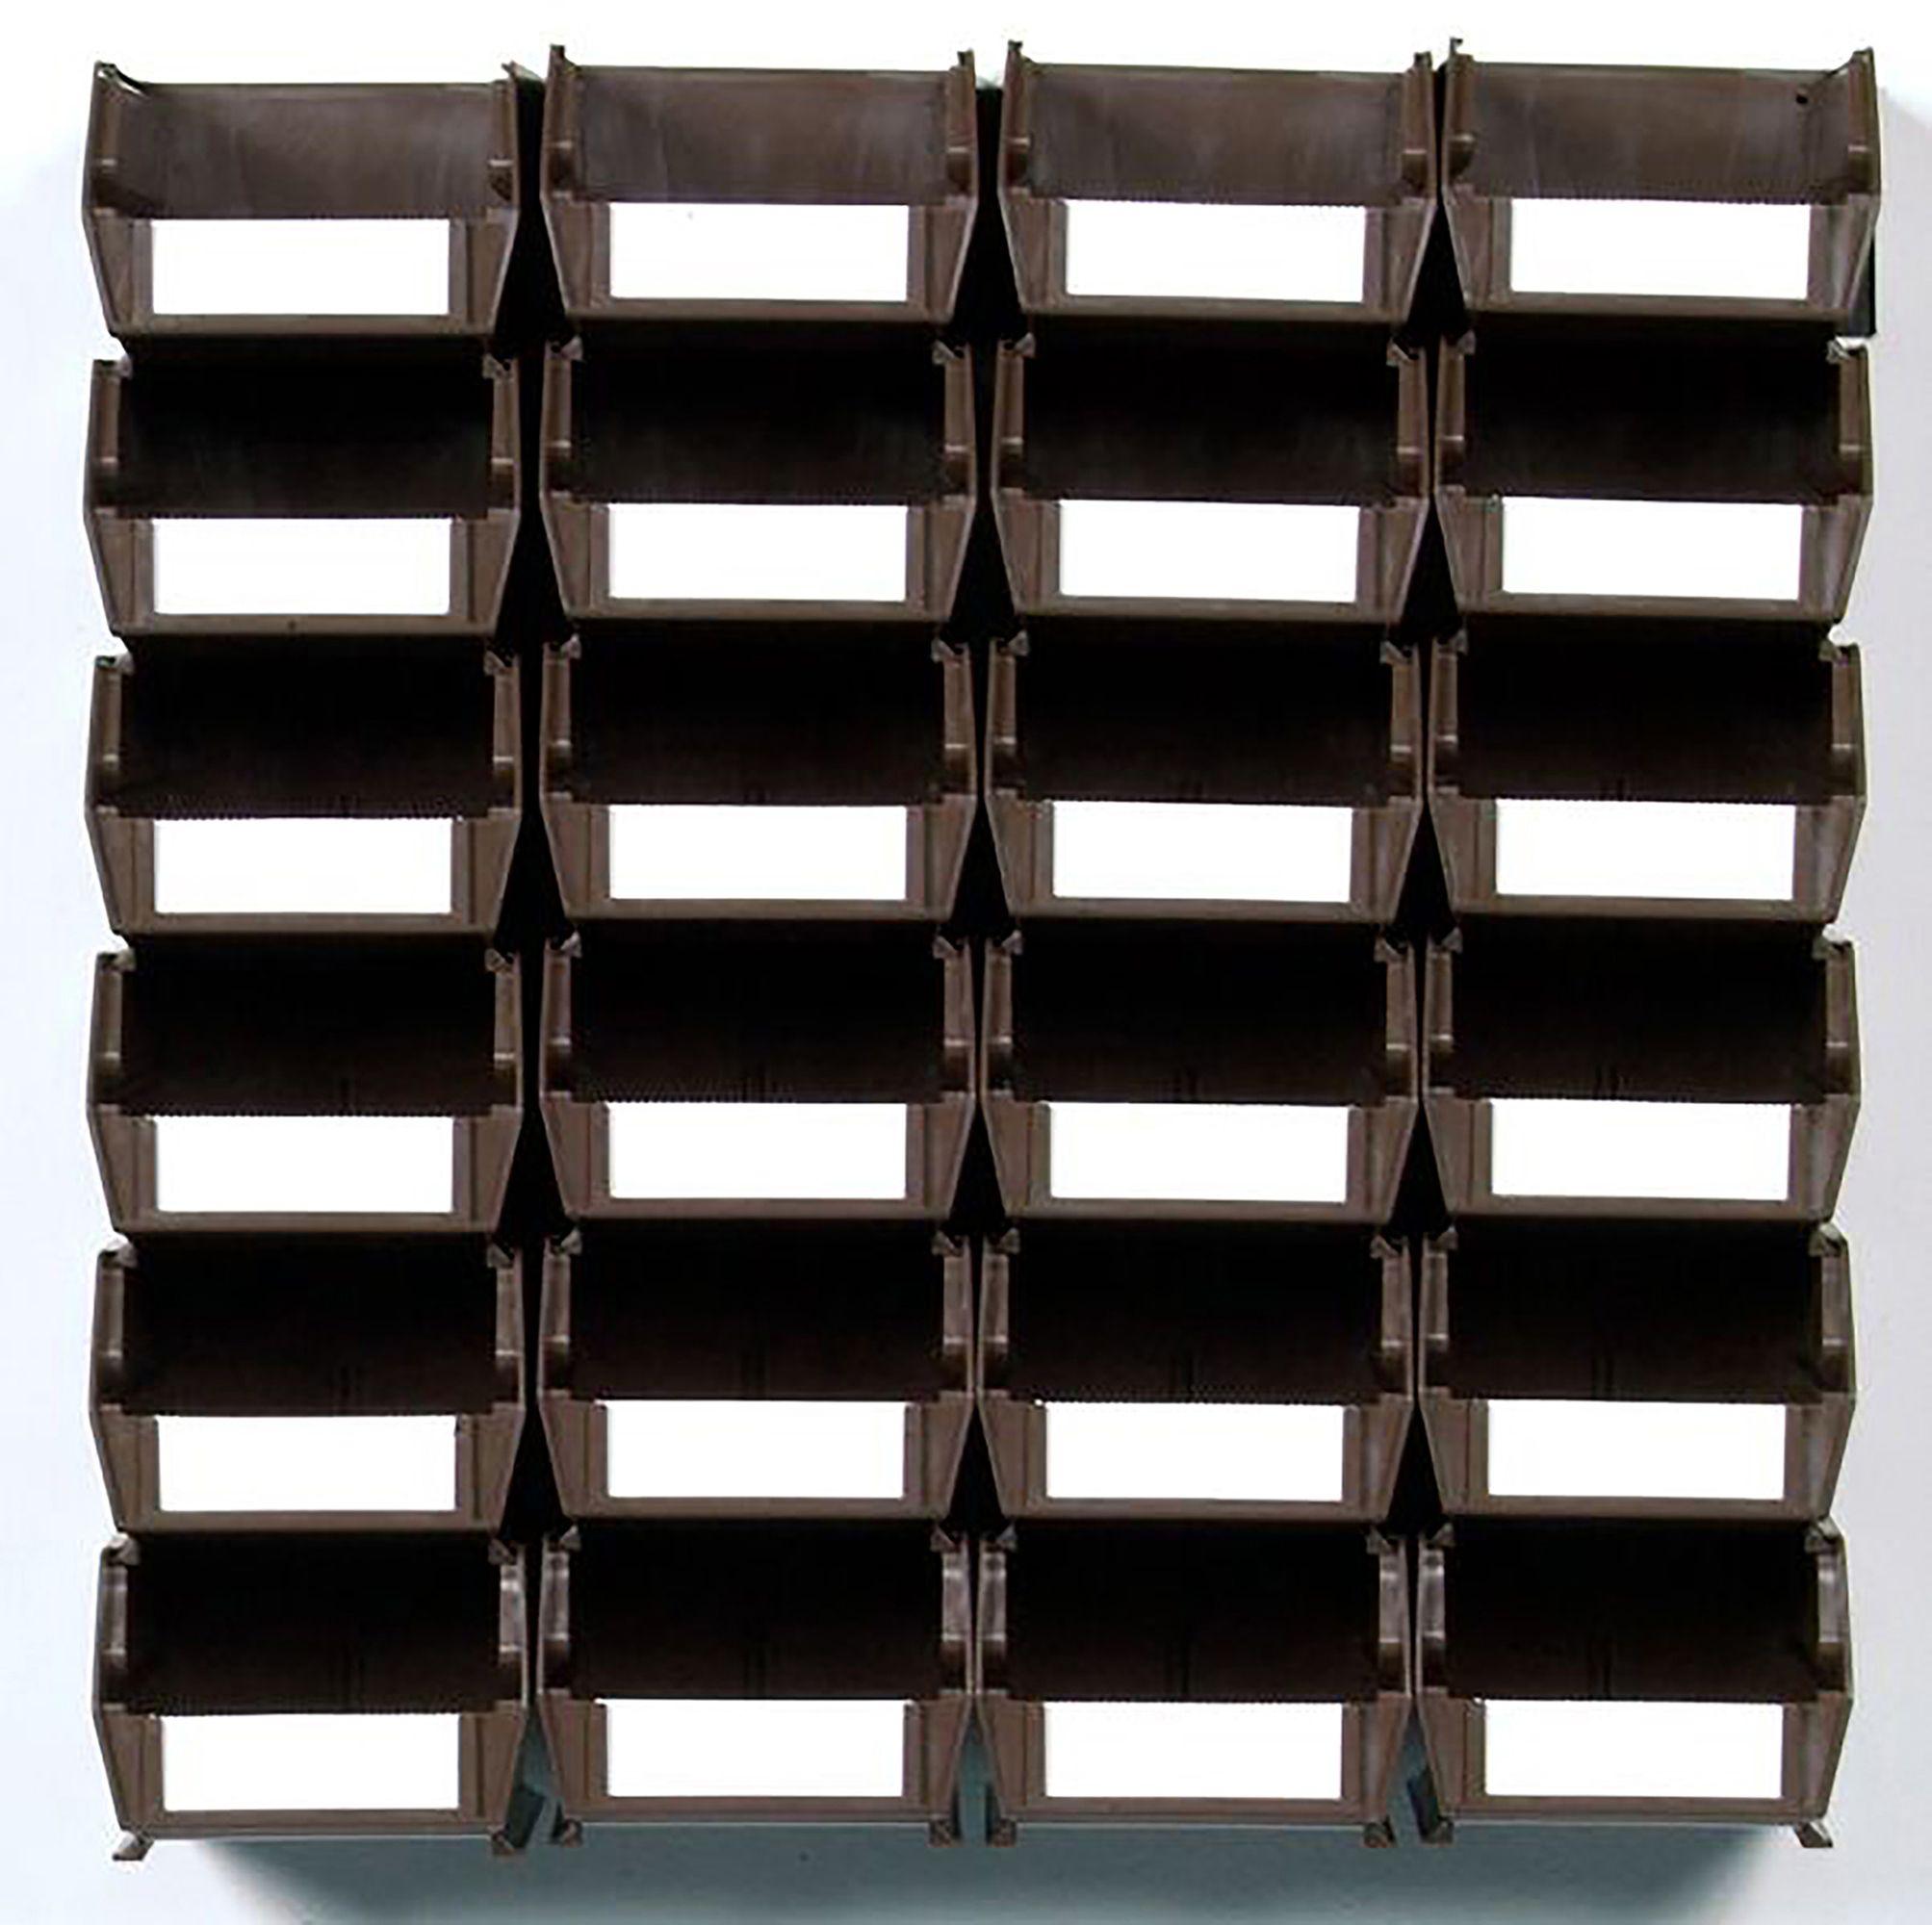 Triton Locbin 24 Bin Wall Storage With Rails Brown, Model# 3